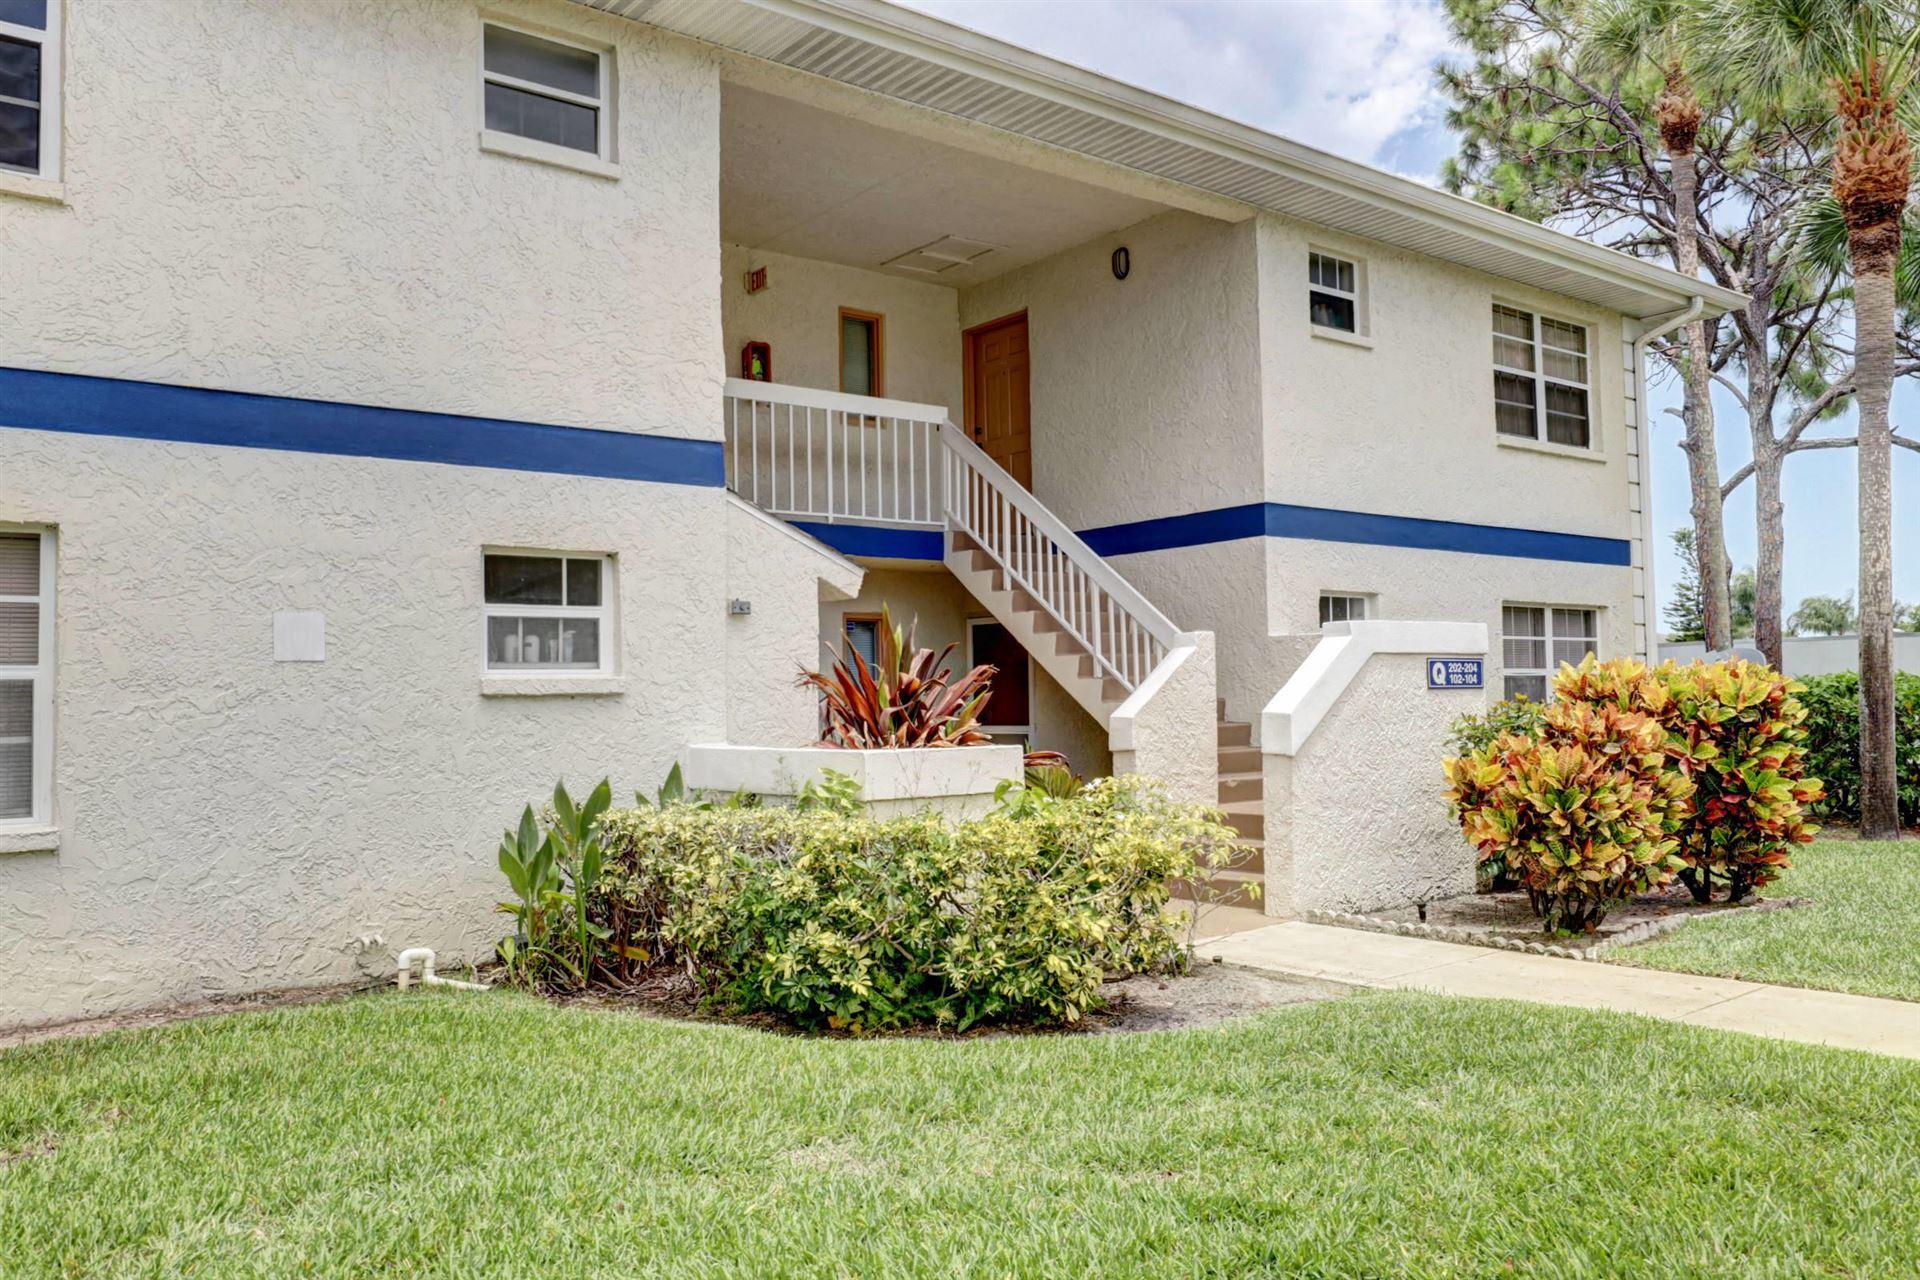 1524 SE Royal Green Circle #Q202, Port Saint Lucie, FL 34952 - #: RX-10641684